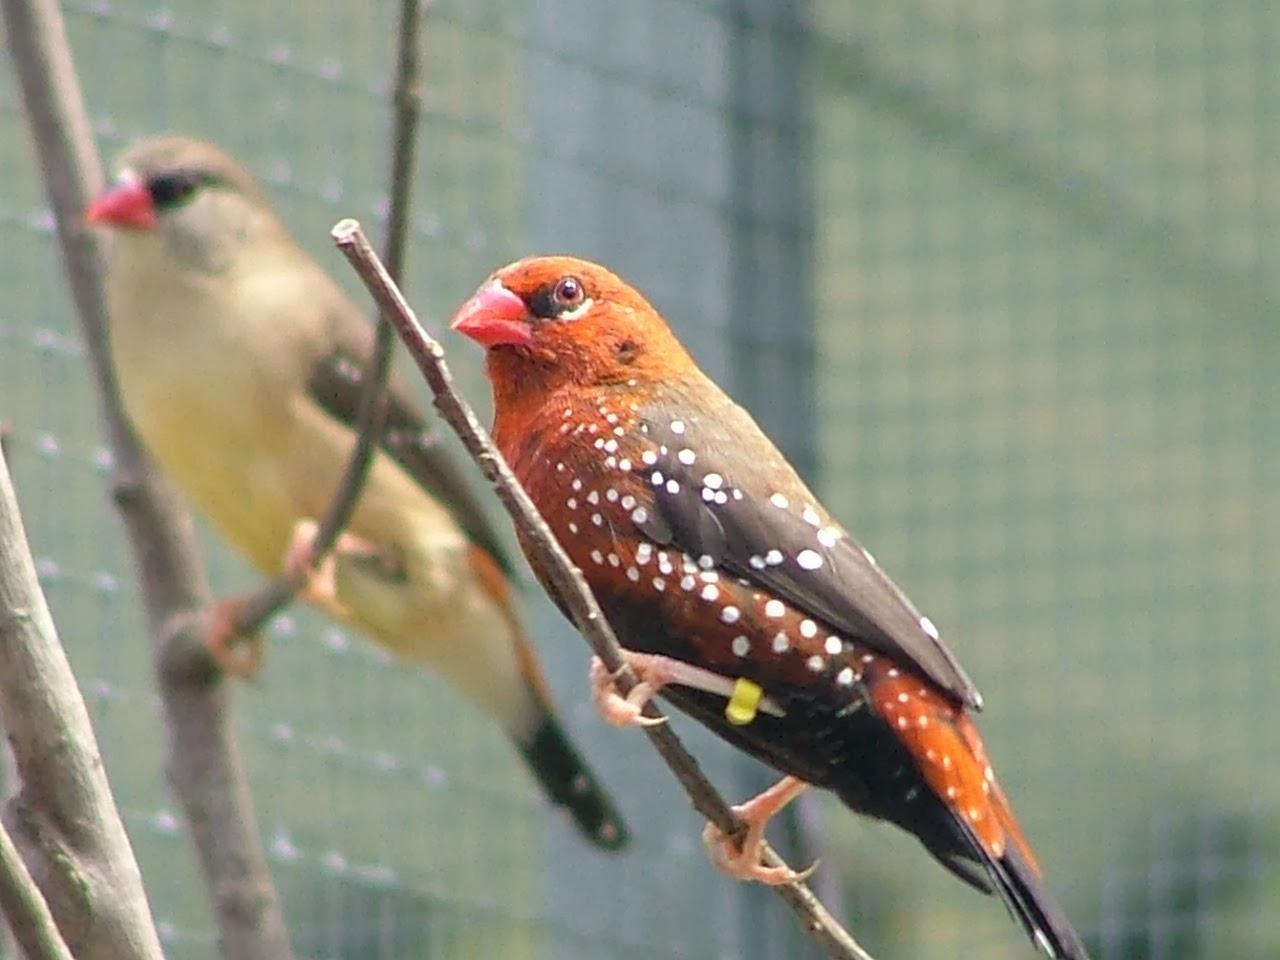 Burung Strawberry Finch Jual Burung Strawberry Finch